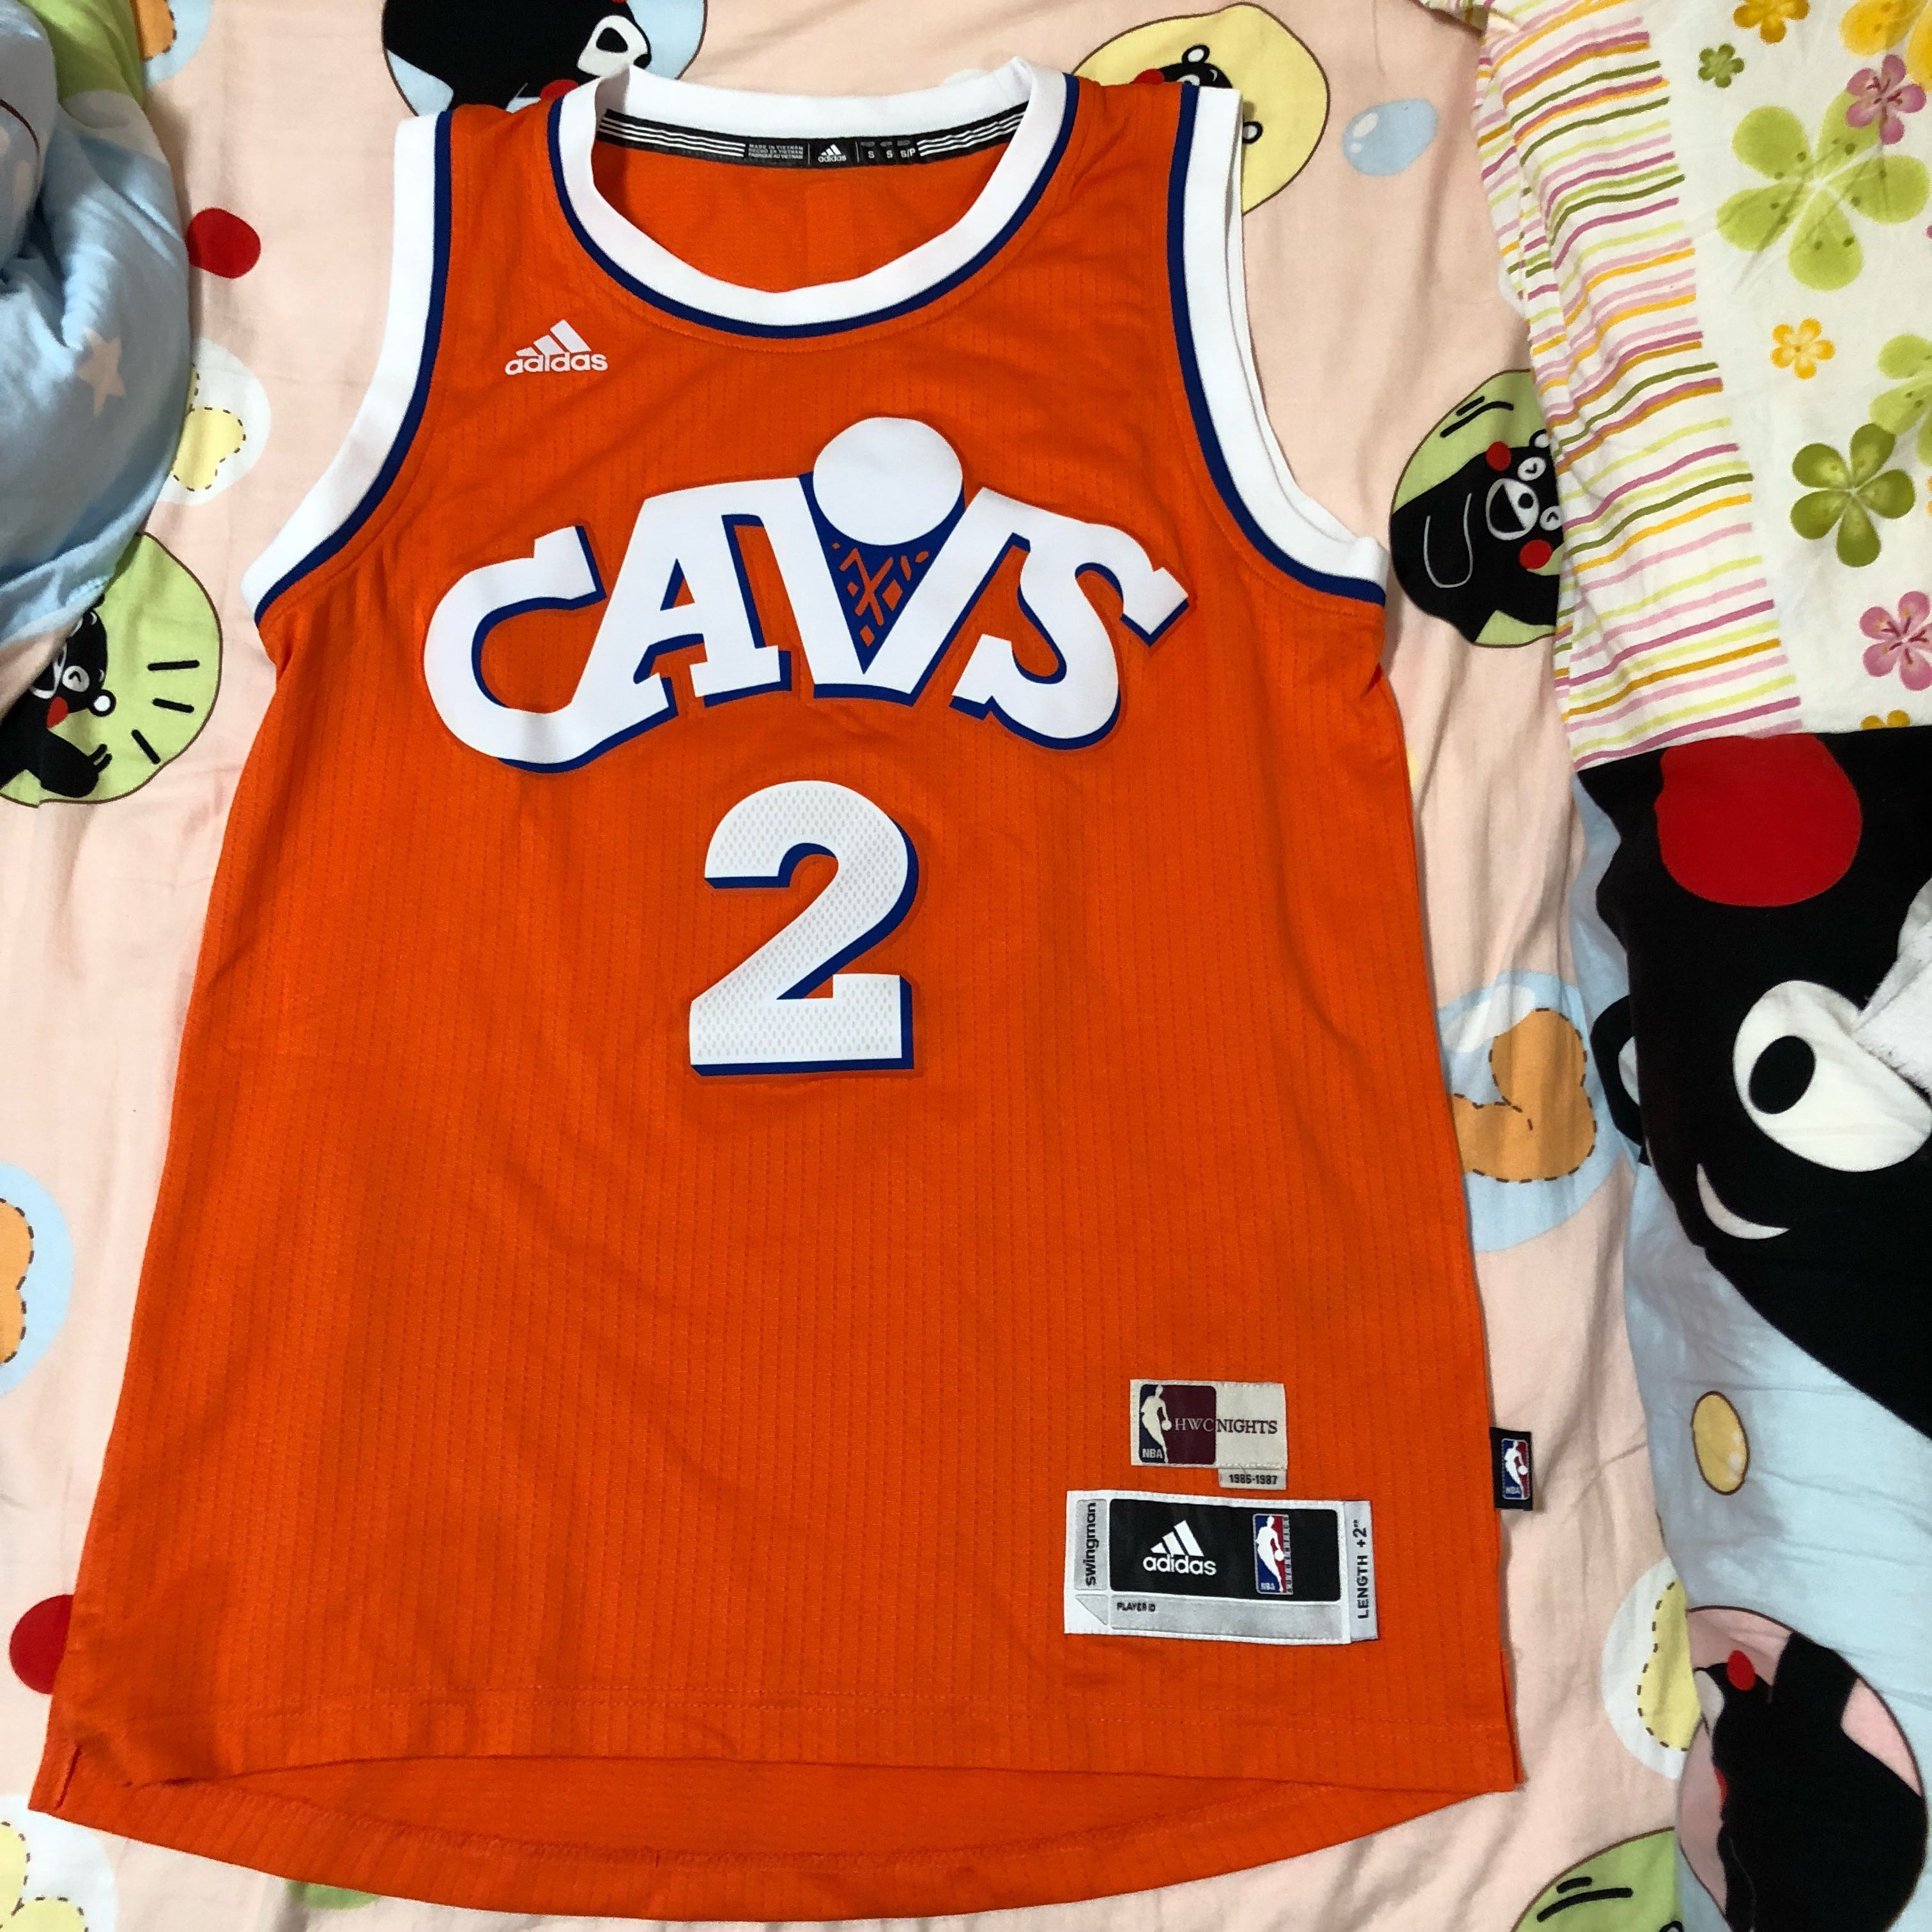 304fdc7c2f2 Adidas NBA 波衫/ 球衣Swingman Cavs classics jersey Kyrie Irving ...